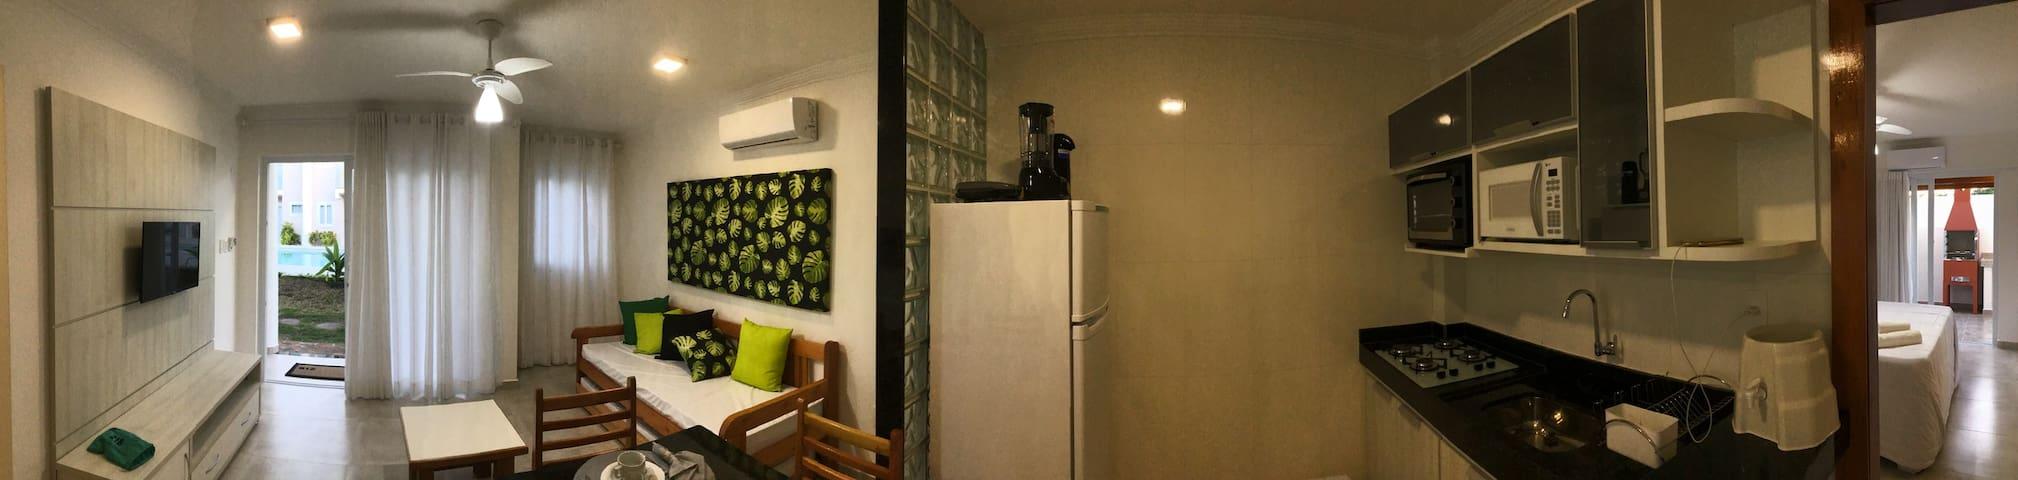 Panorâmica cozinha e sala.